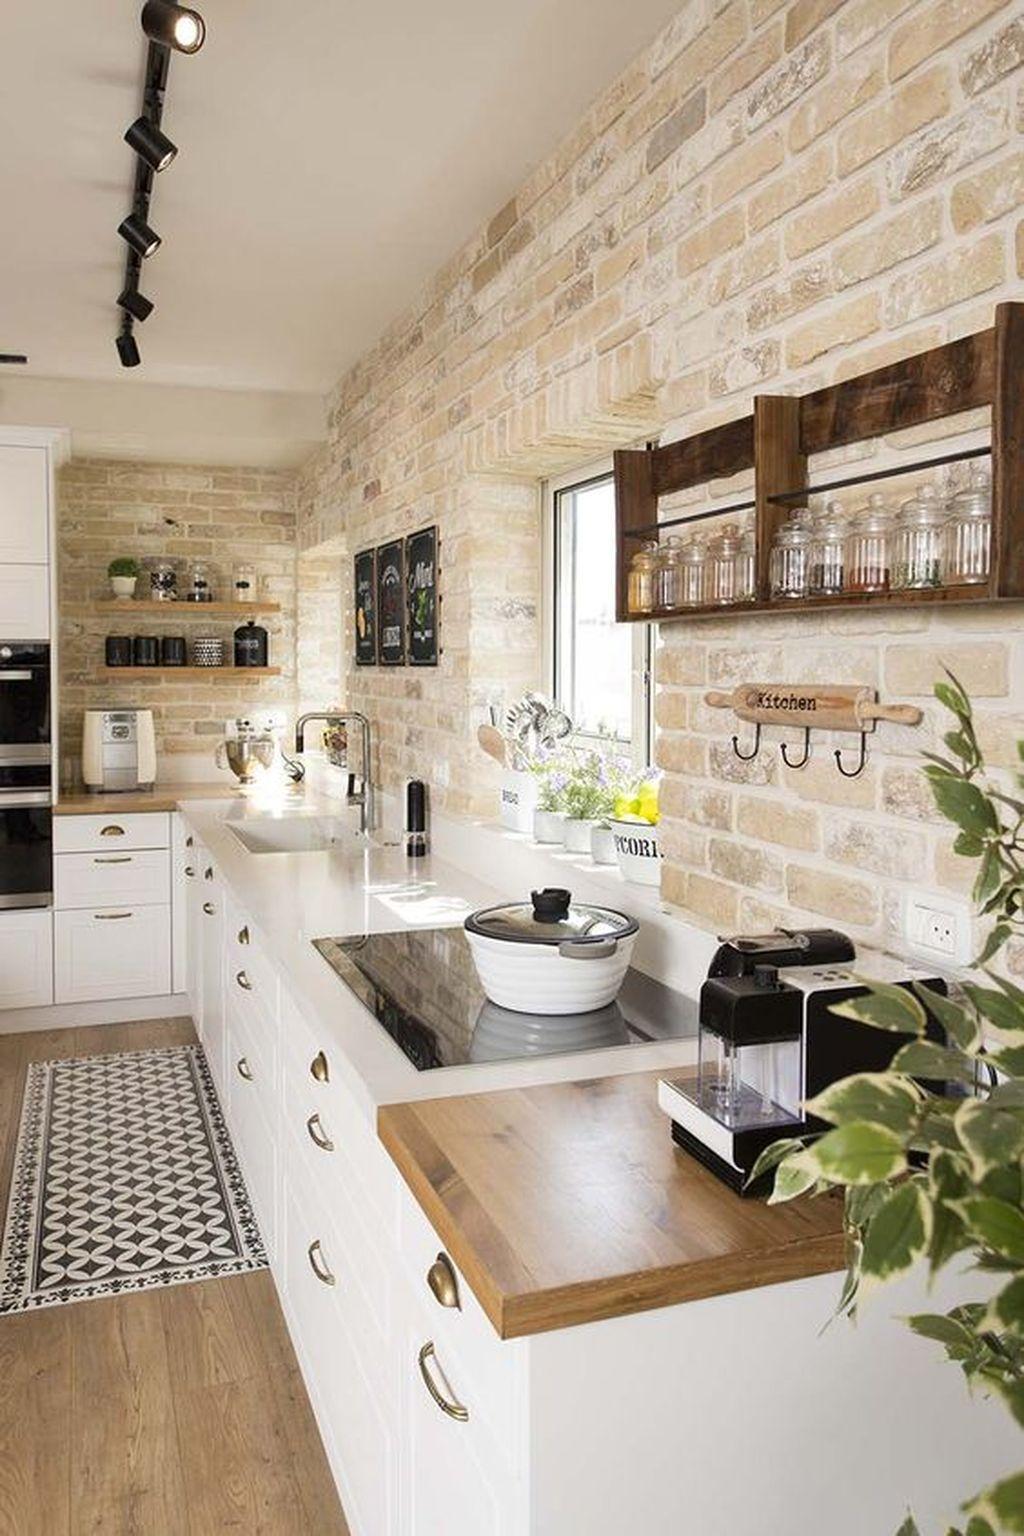 20 Popular Modern Farmhouse Kitchen Backsplash Ideas - Popy Home